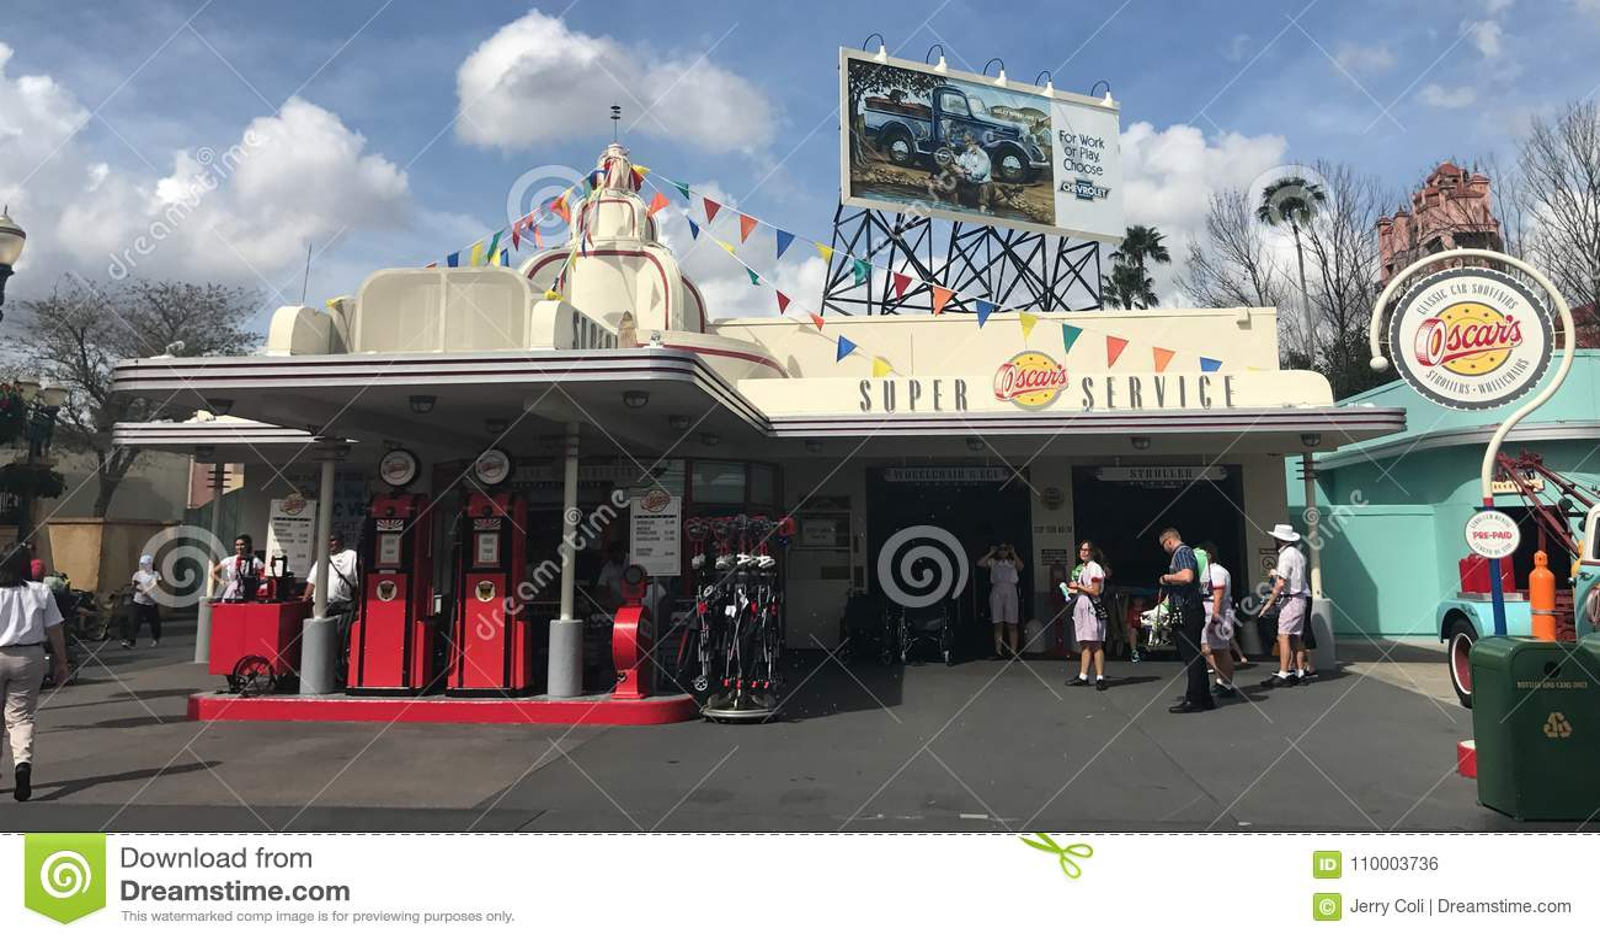 Toppen service för Oscar ` s, Hollywood studior, Orlando, FL